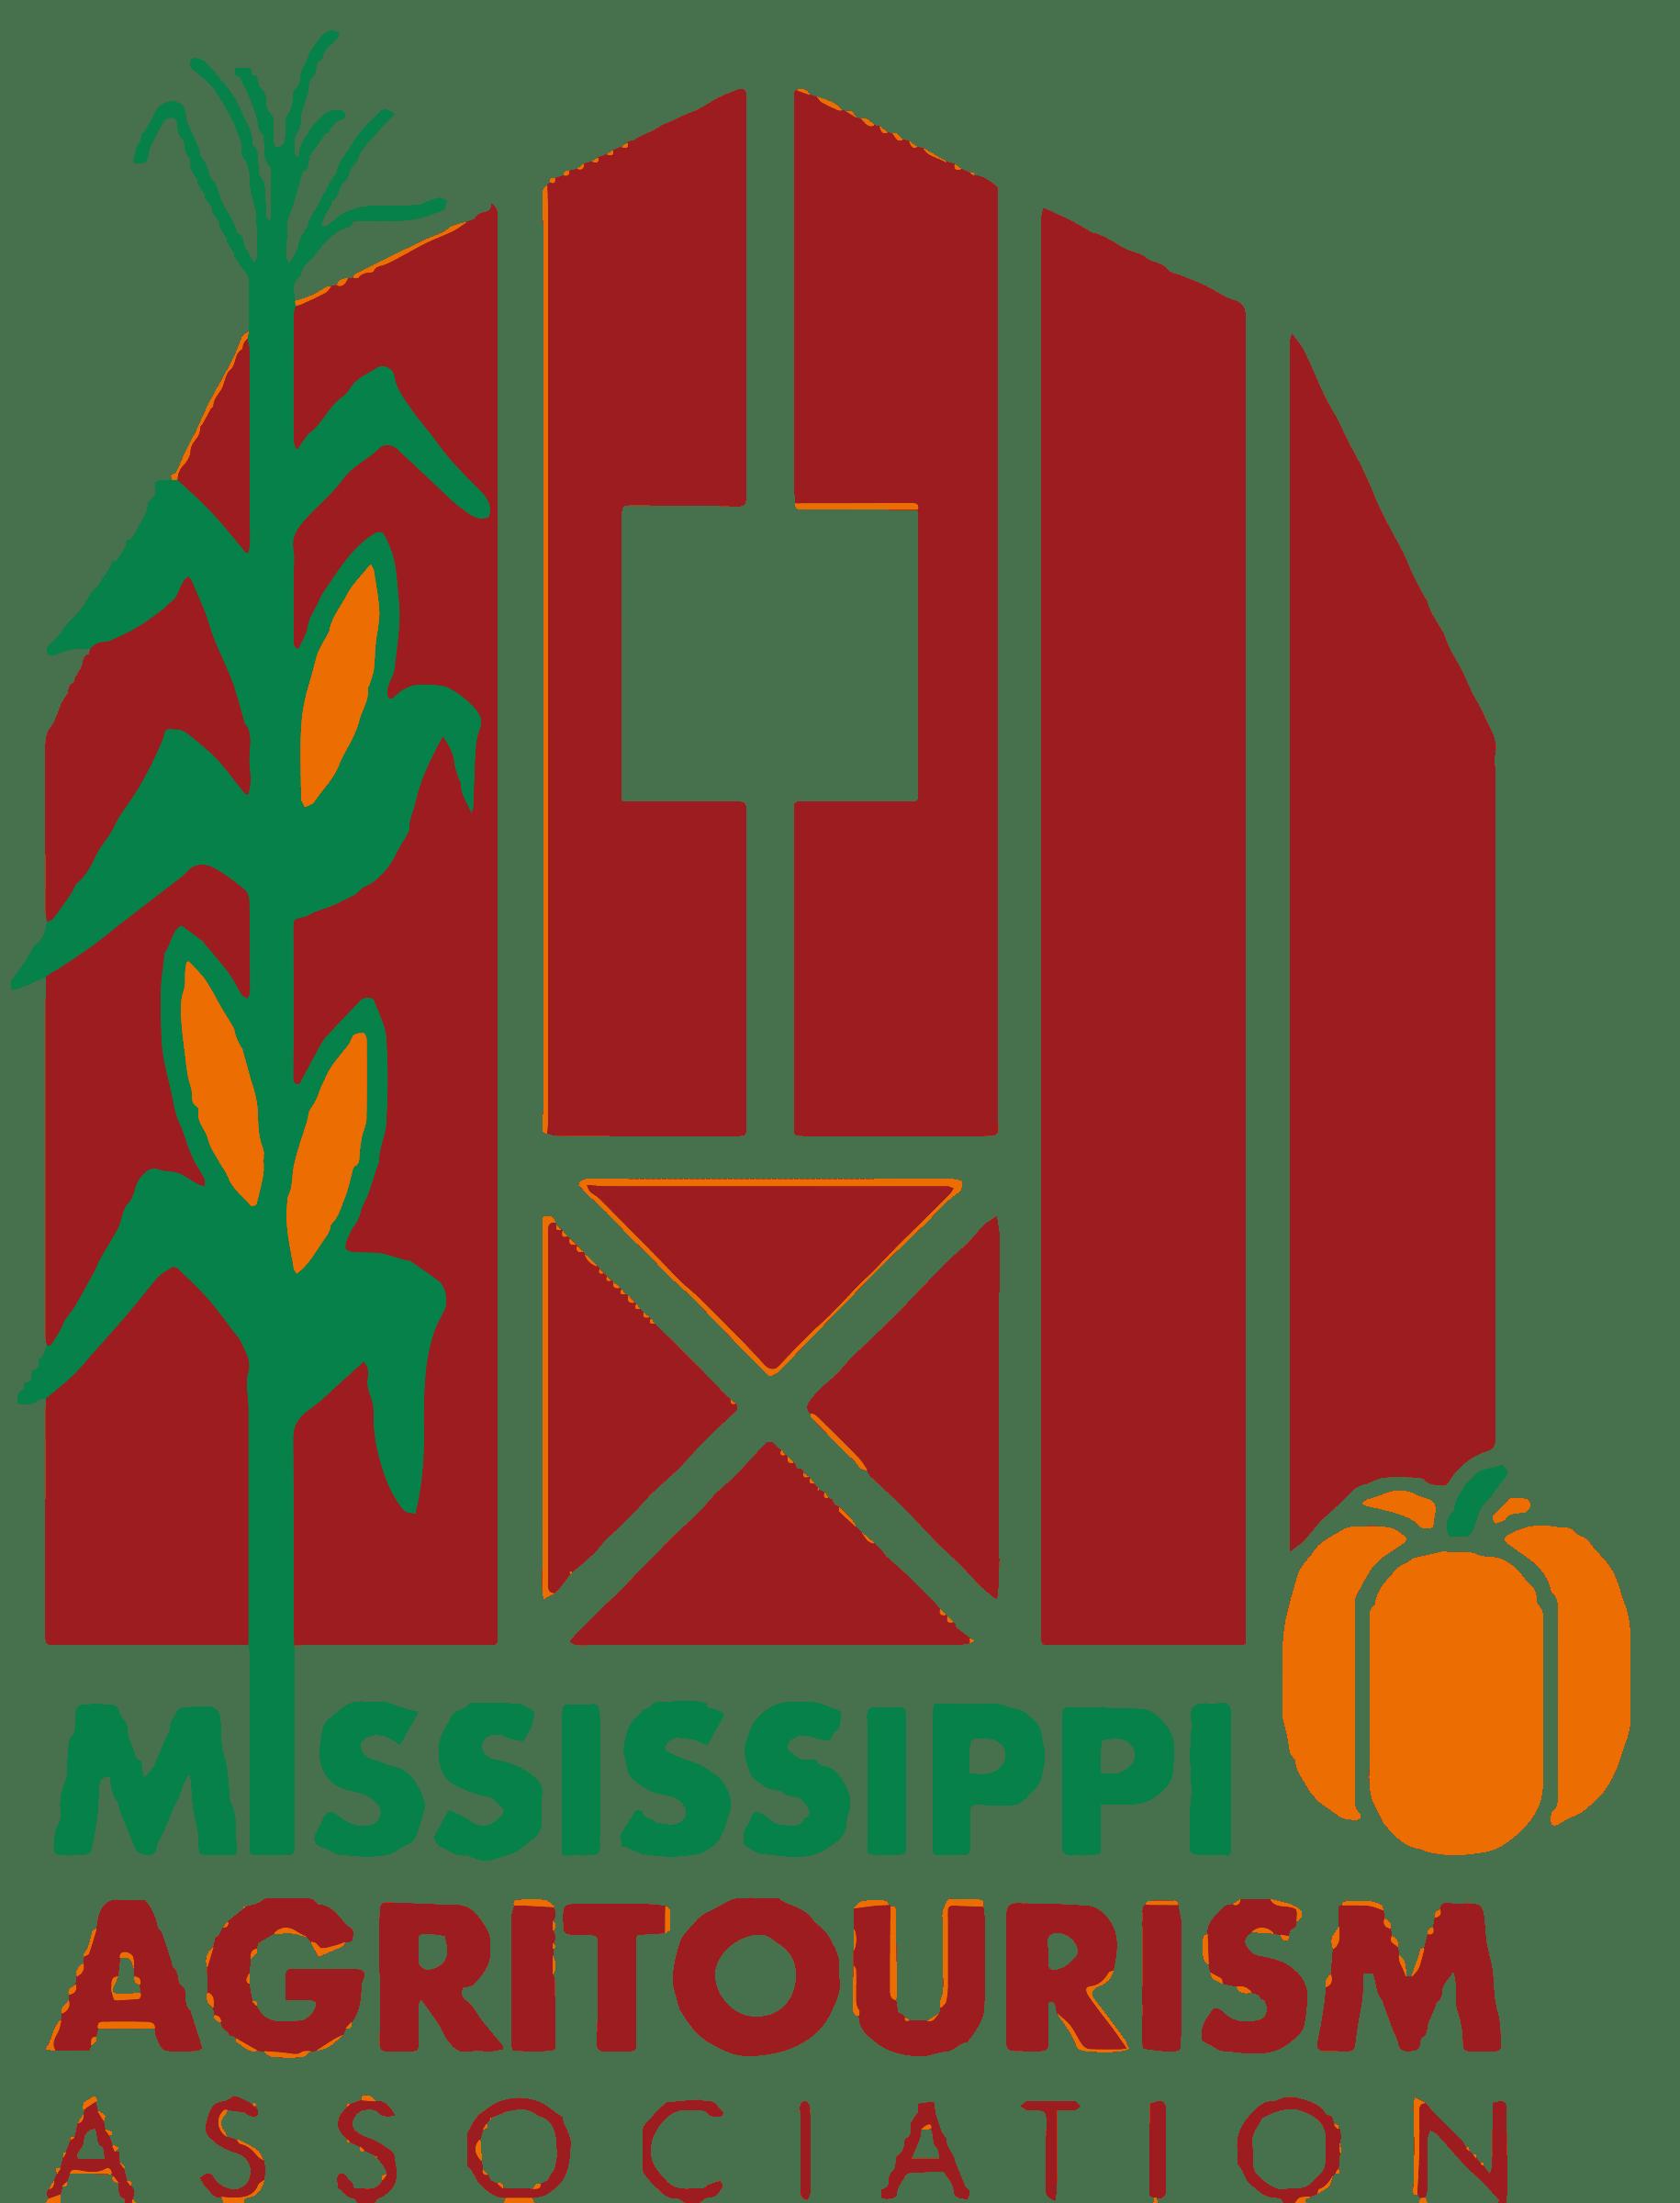 Pumpkin gordes hd clipart banner library stock Pumpkin Stand Prices   Cedar Hill Farm   Weddings & Receptions banner library stock